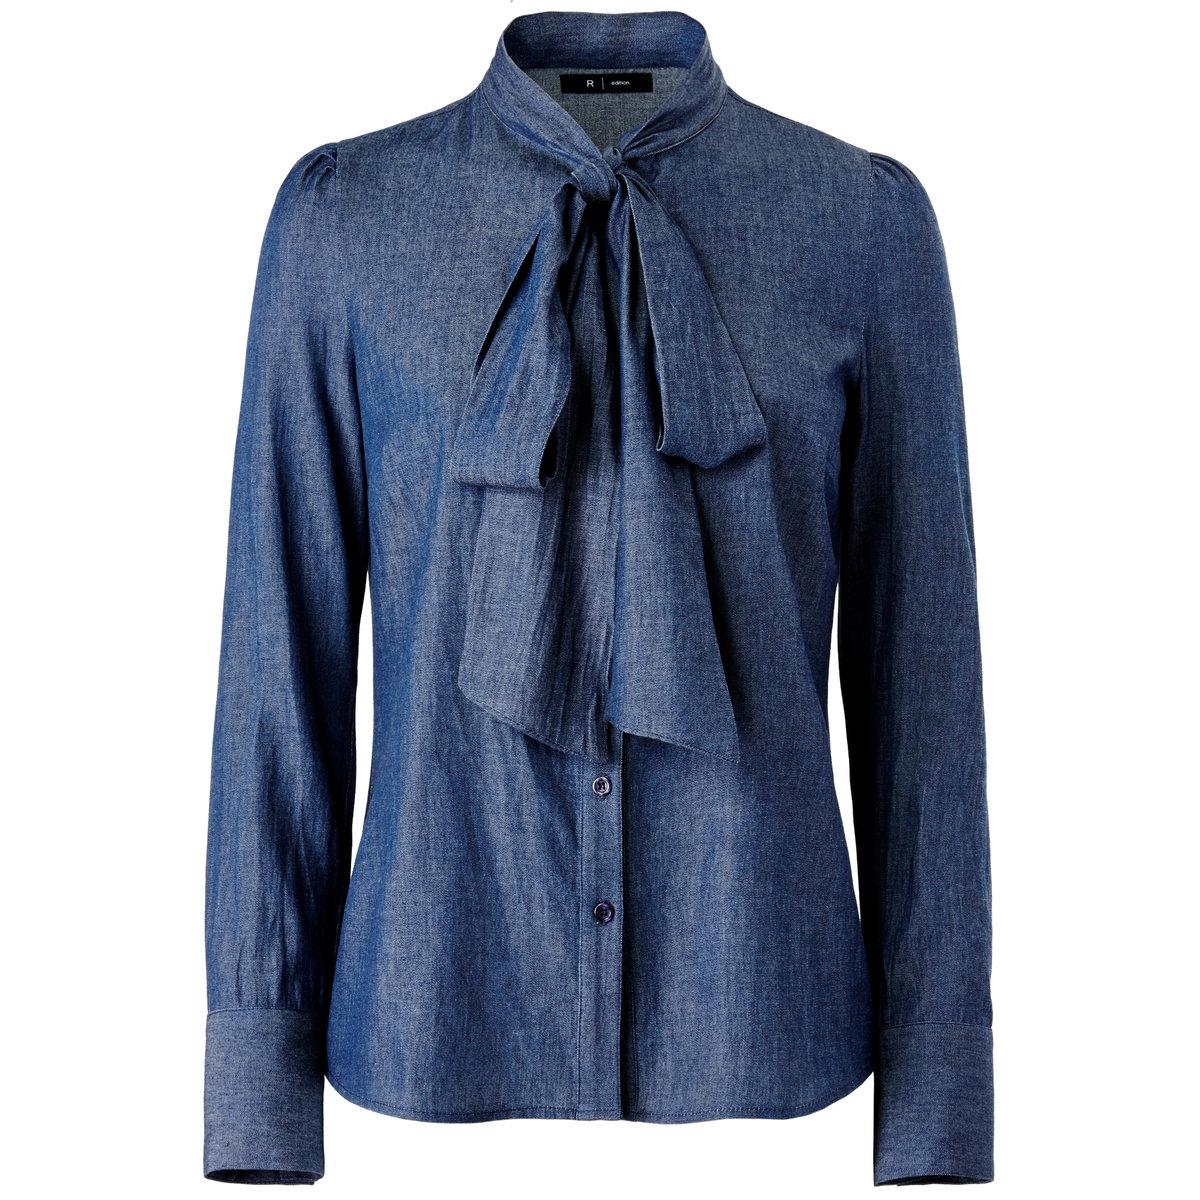 Блузка, 100% хлопка.<br><br>Цвет: деним<br>Размер: 34 (FR) - 40 (RUS).46 (FR) - 52 (RUS)